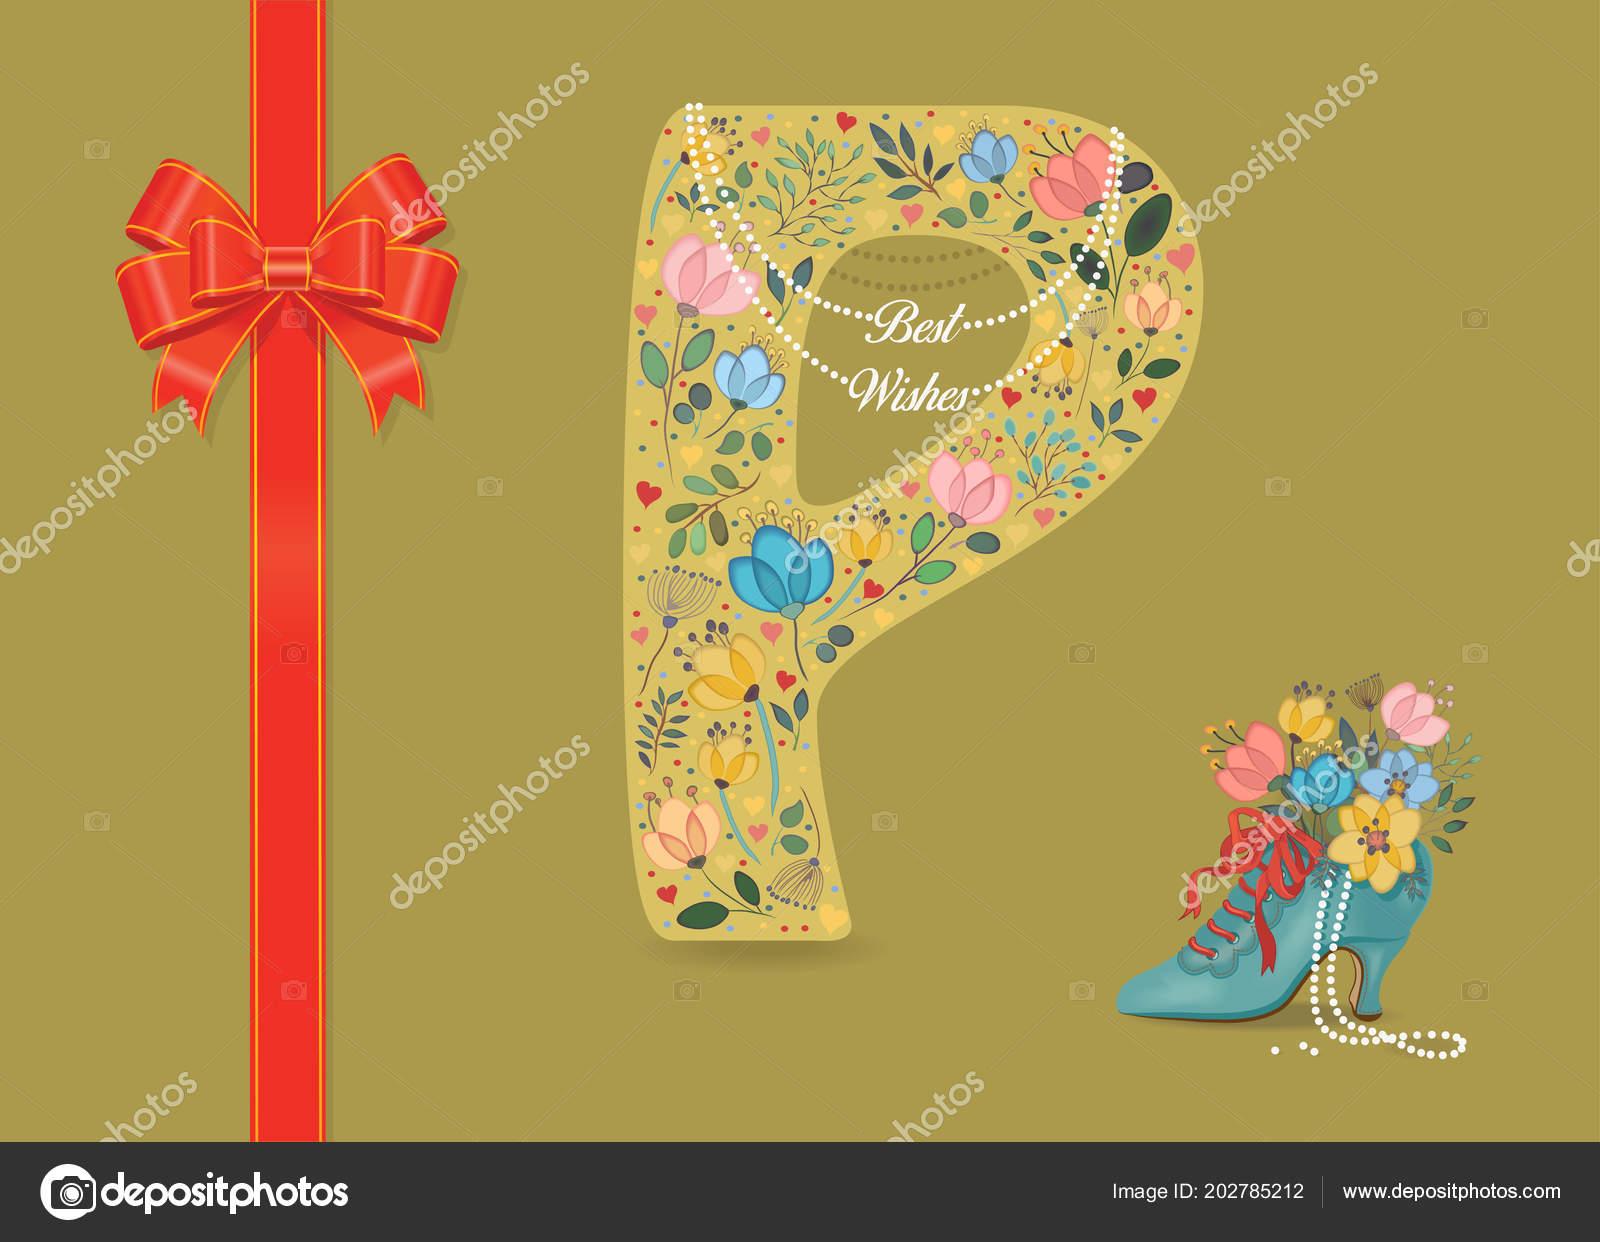 Artistic Letter P With Folk Botanical Decor